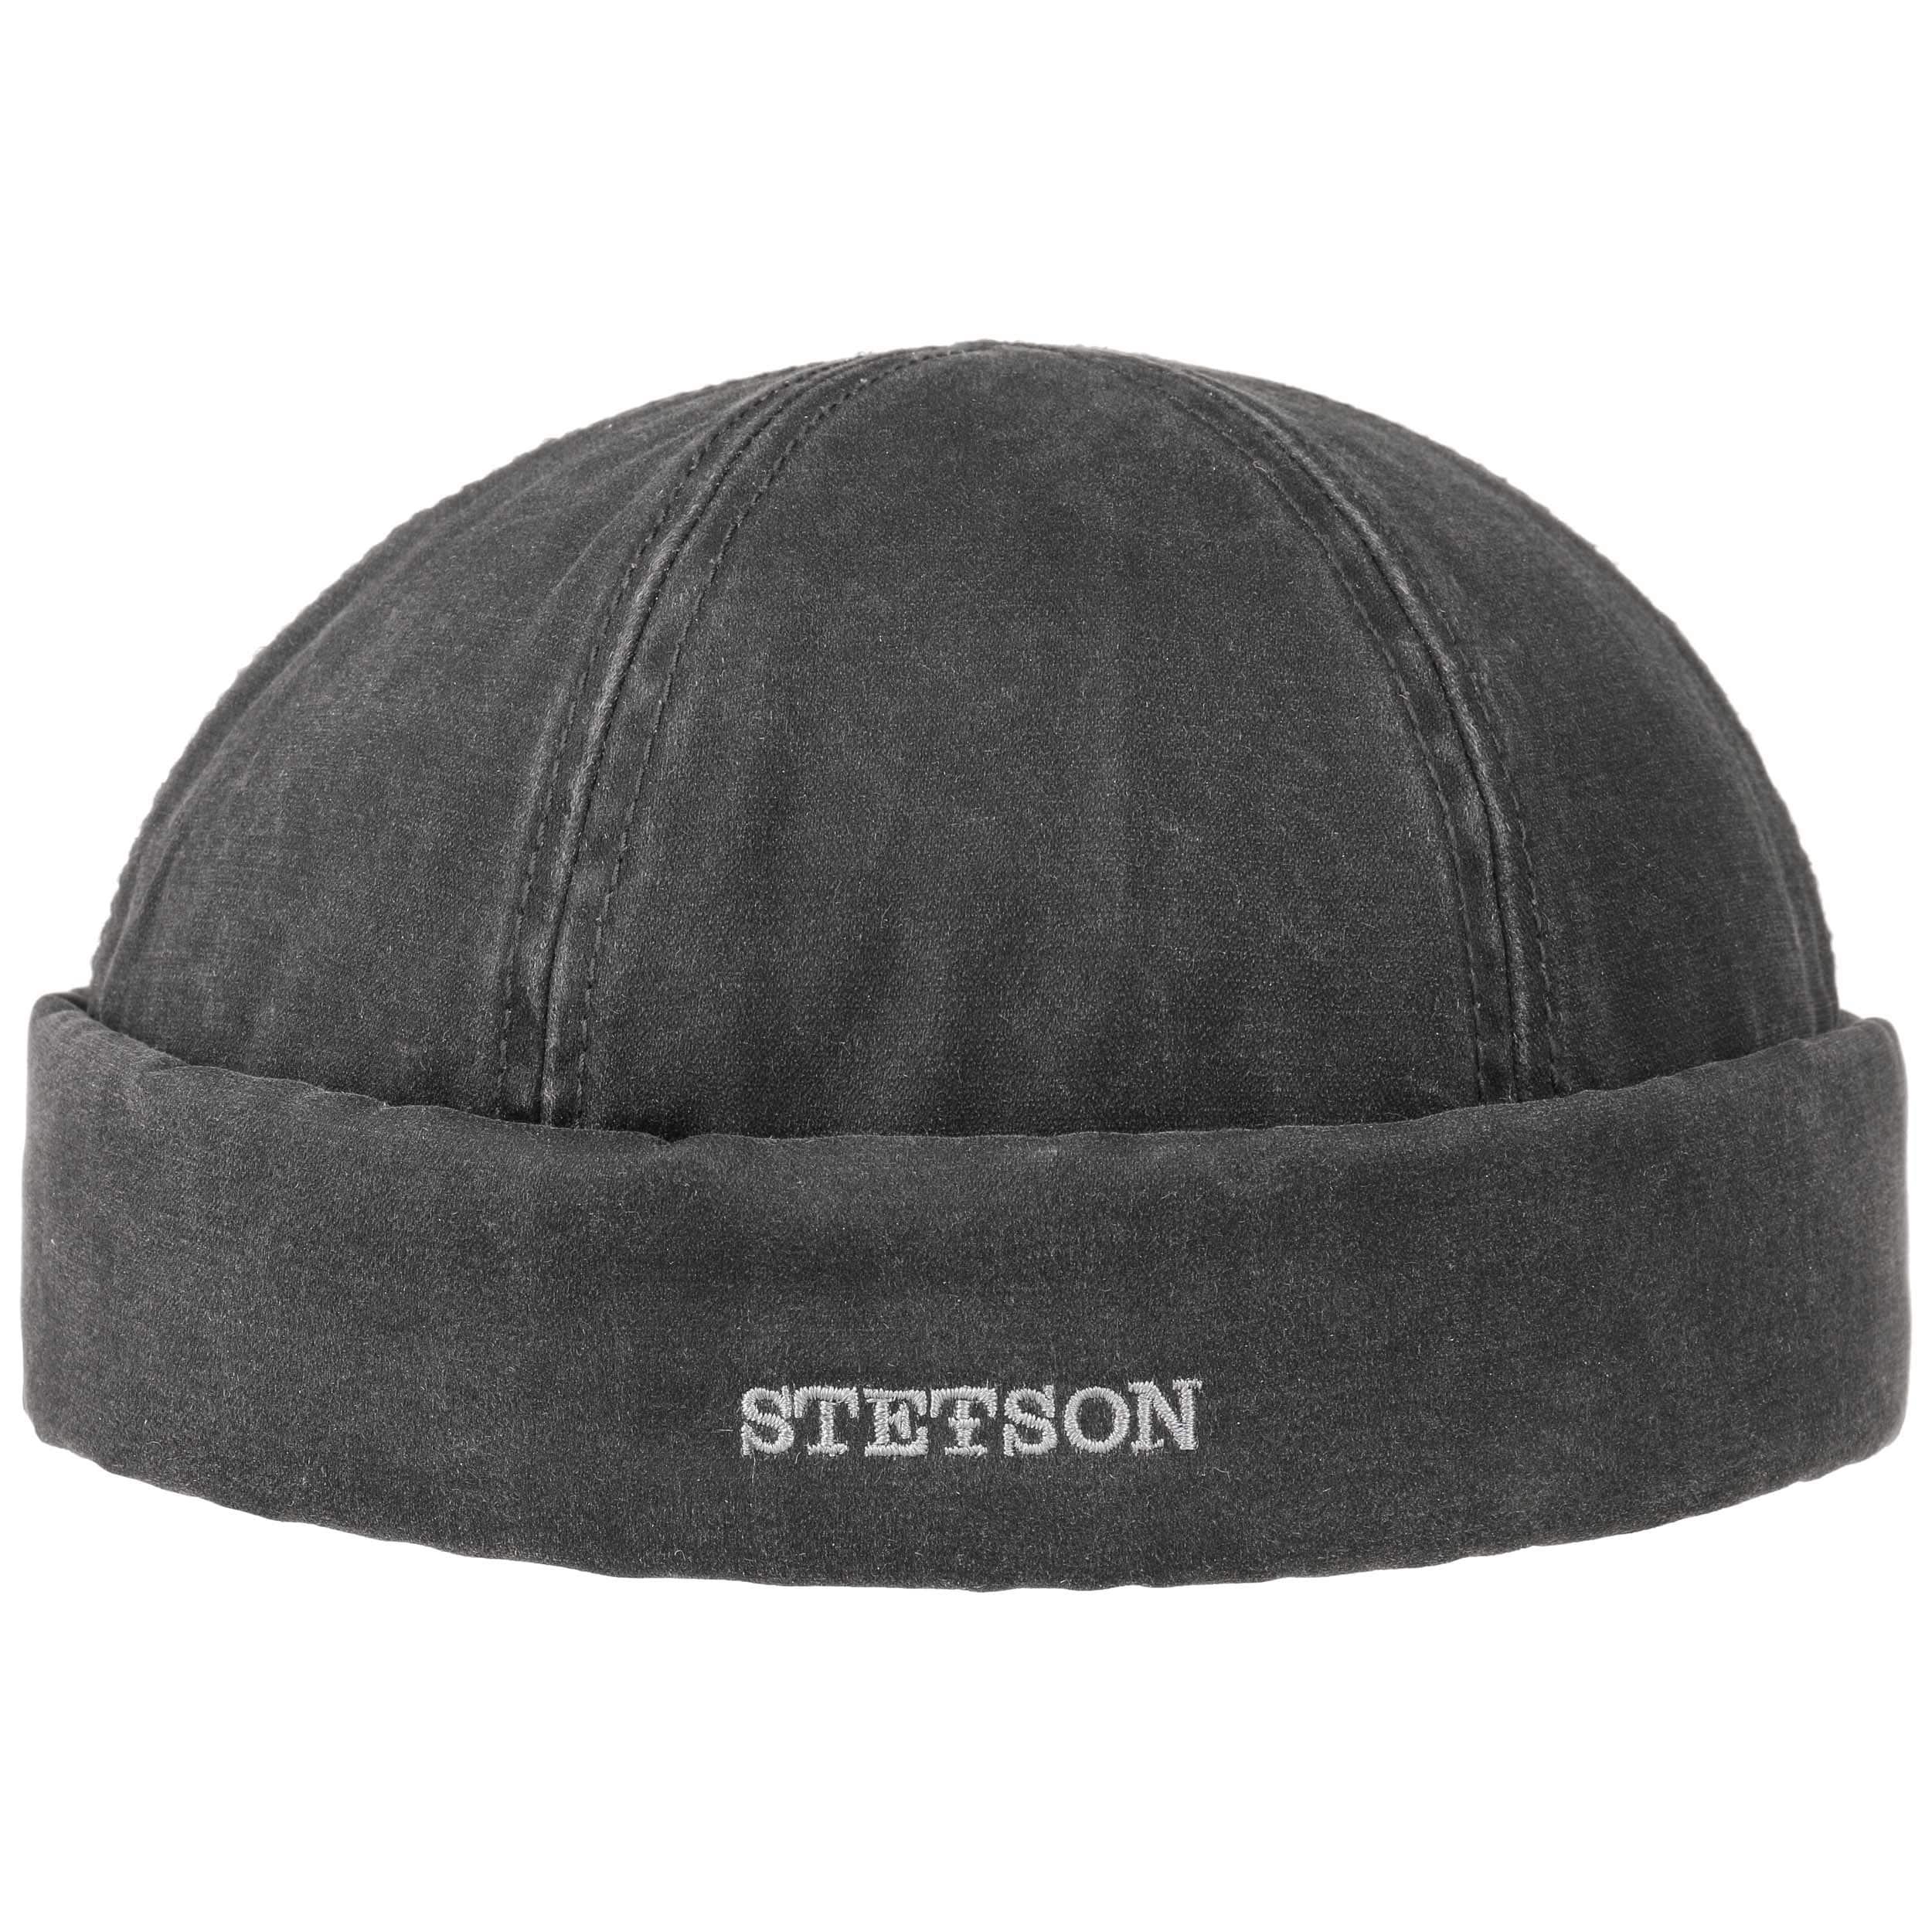 518a903844bef ... Old Cotton Winter Docker Hat by Stetson - black 5